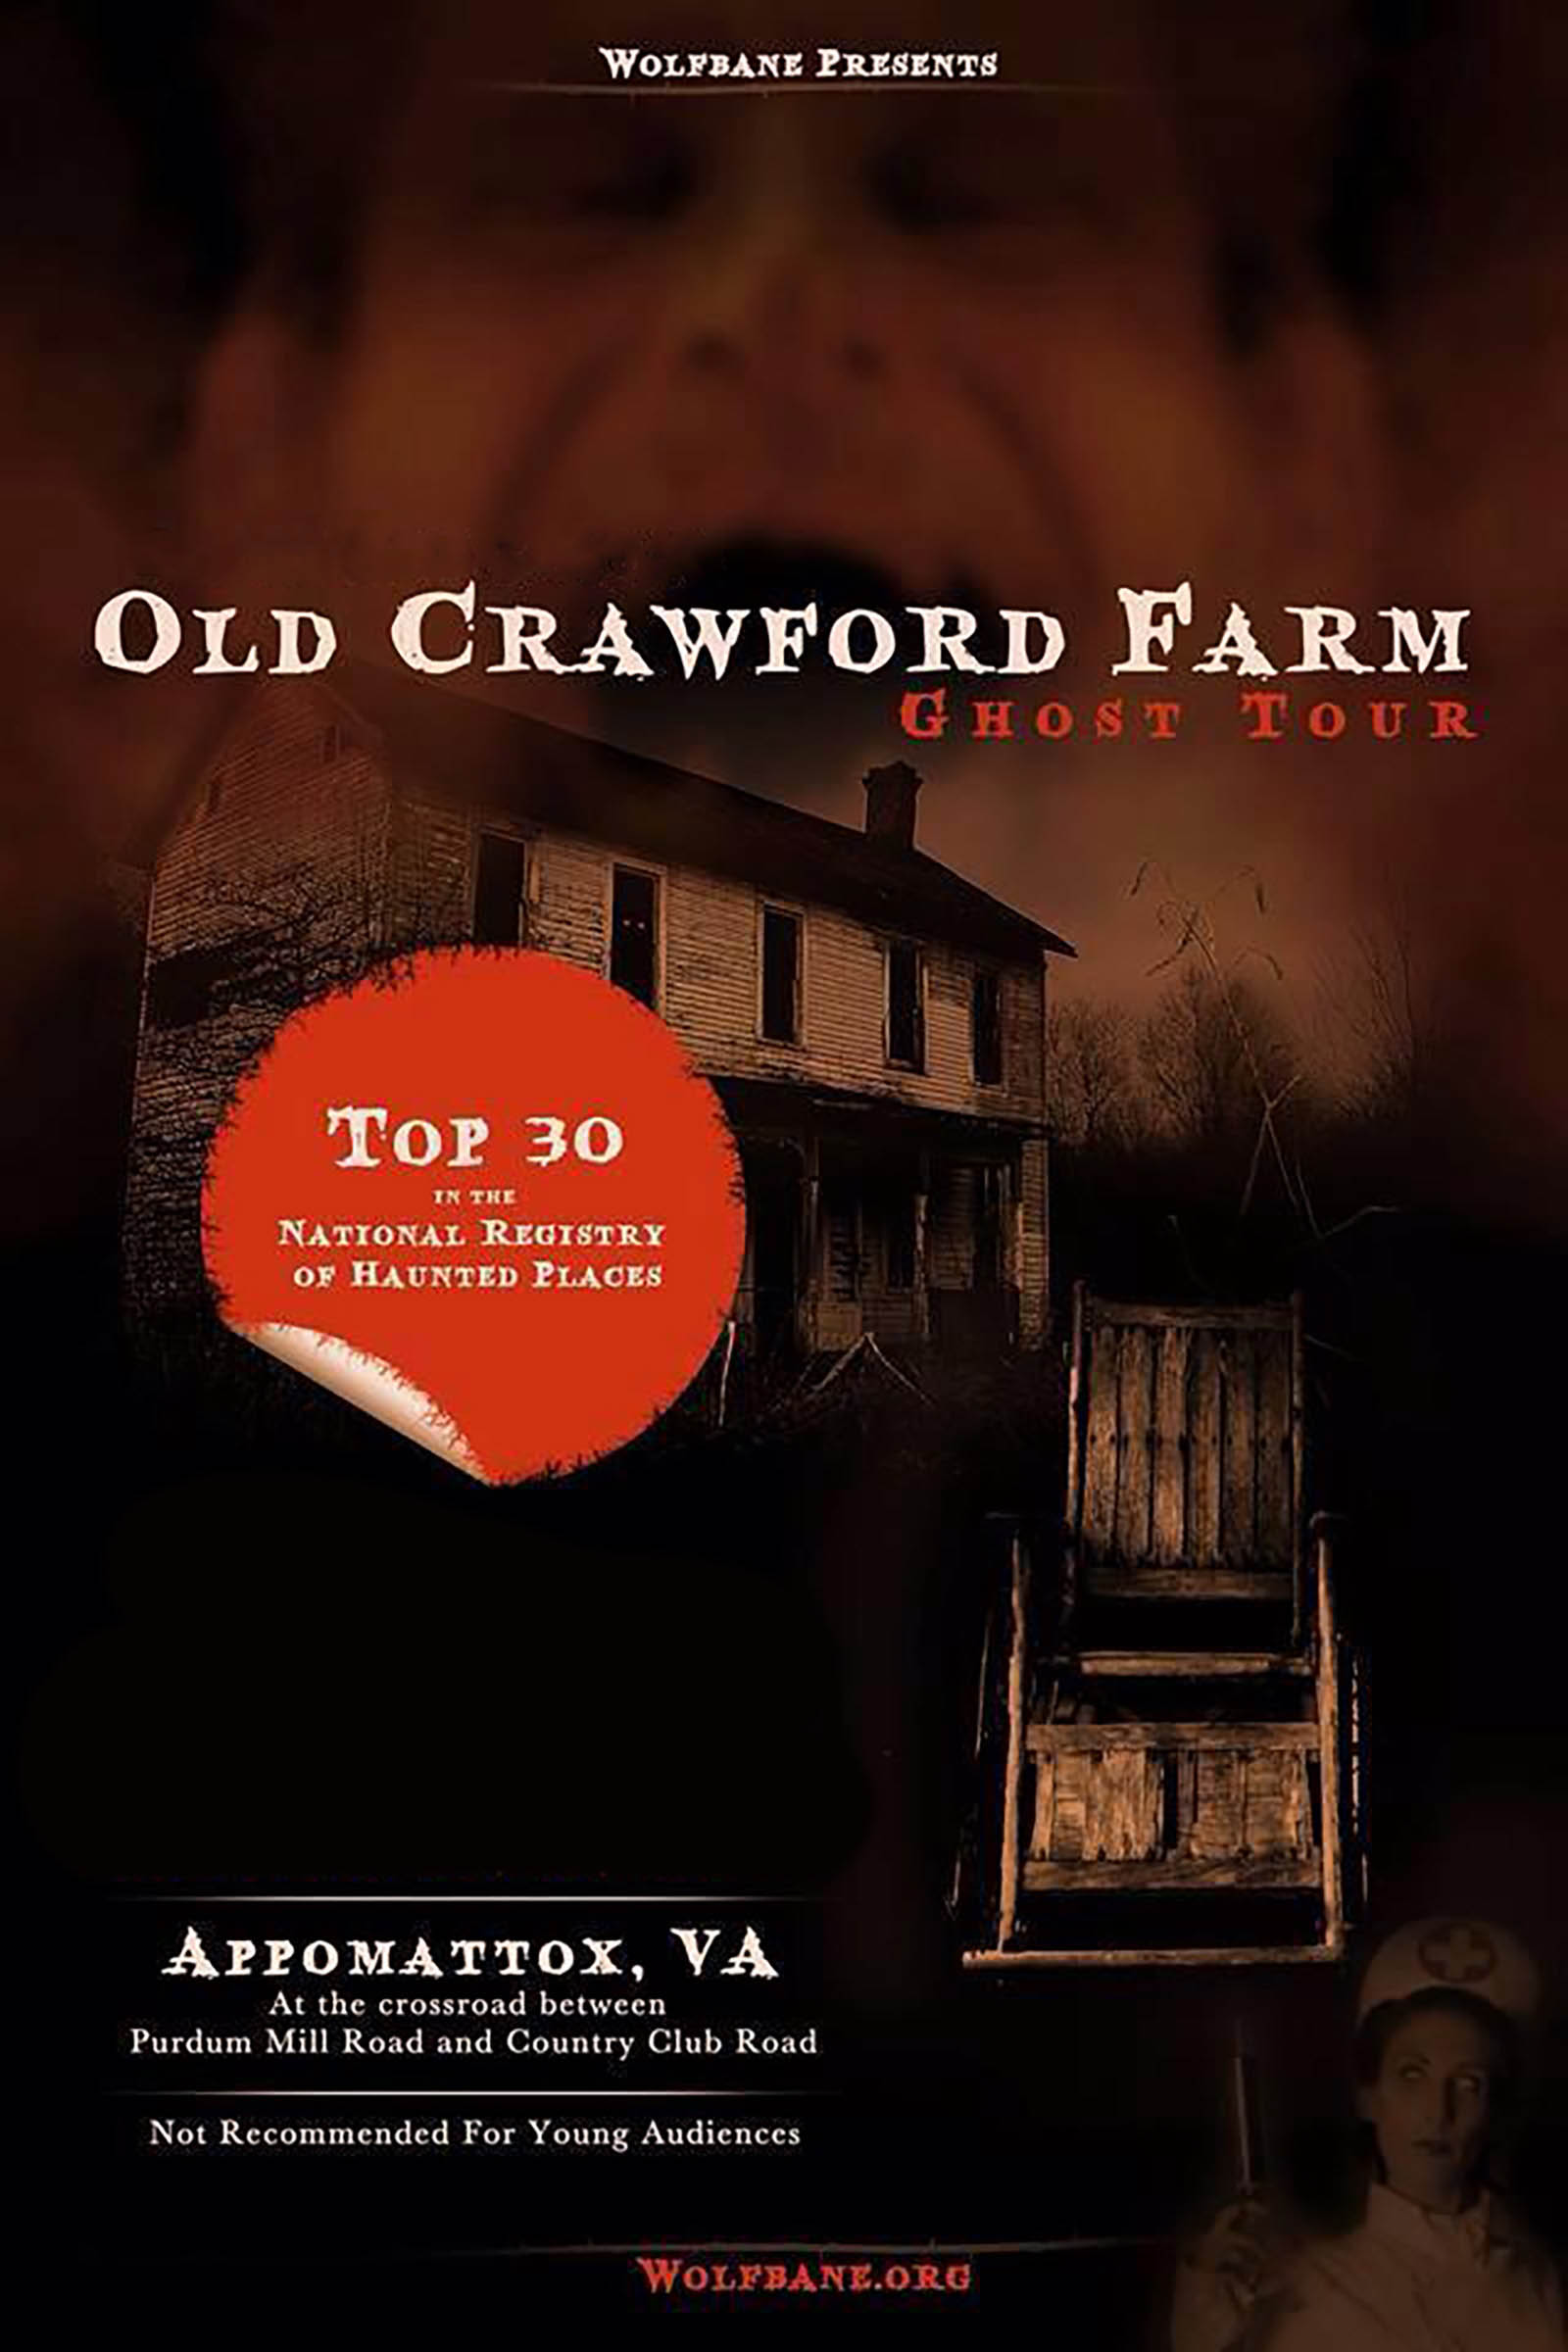 Crawford Farm Ghost Tour